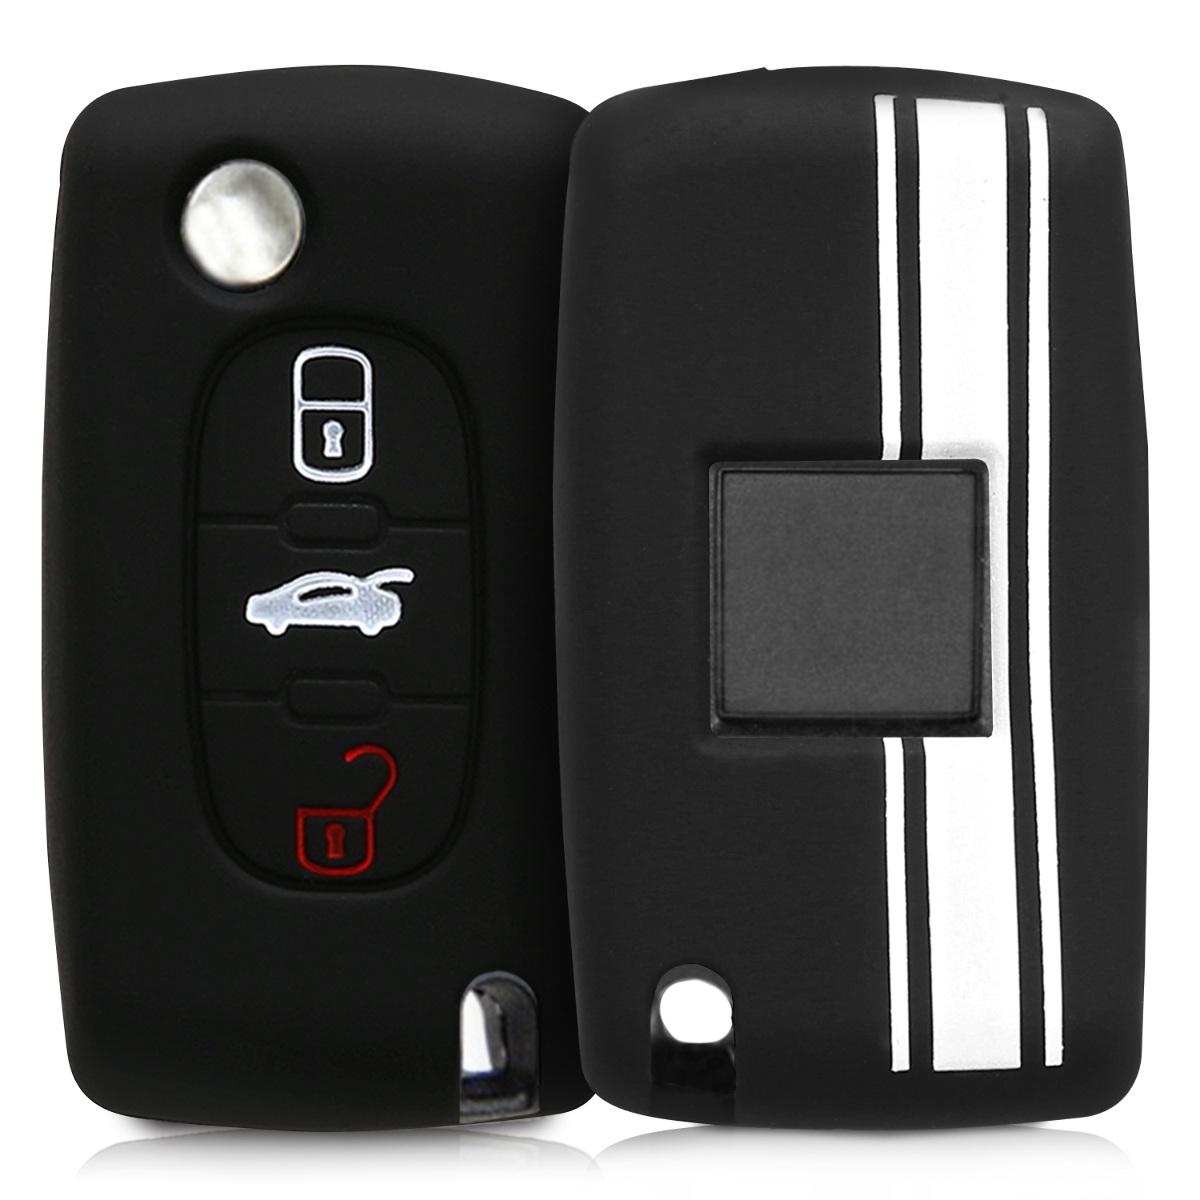 KW Θήκη Κλειδιού Peugeot Citroen - Σιλικόνη - 3 κουμπιά - Μαύρο/Άσπρο (45653.04)